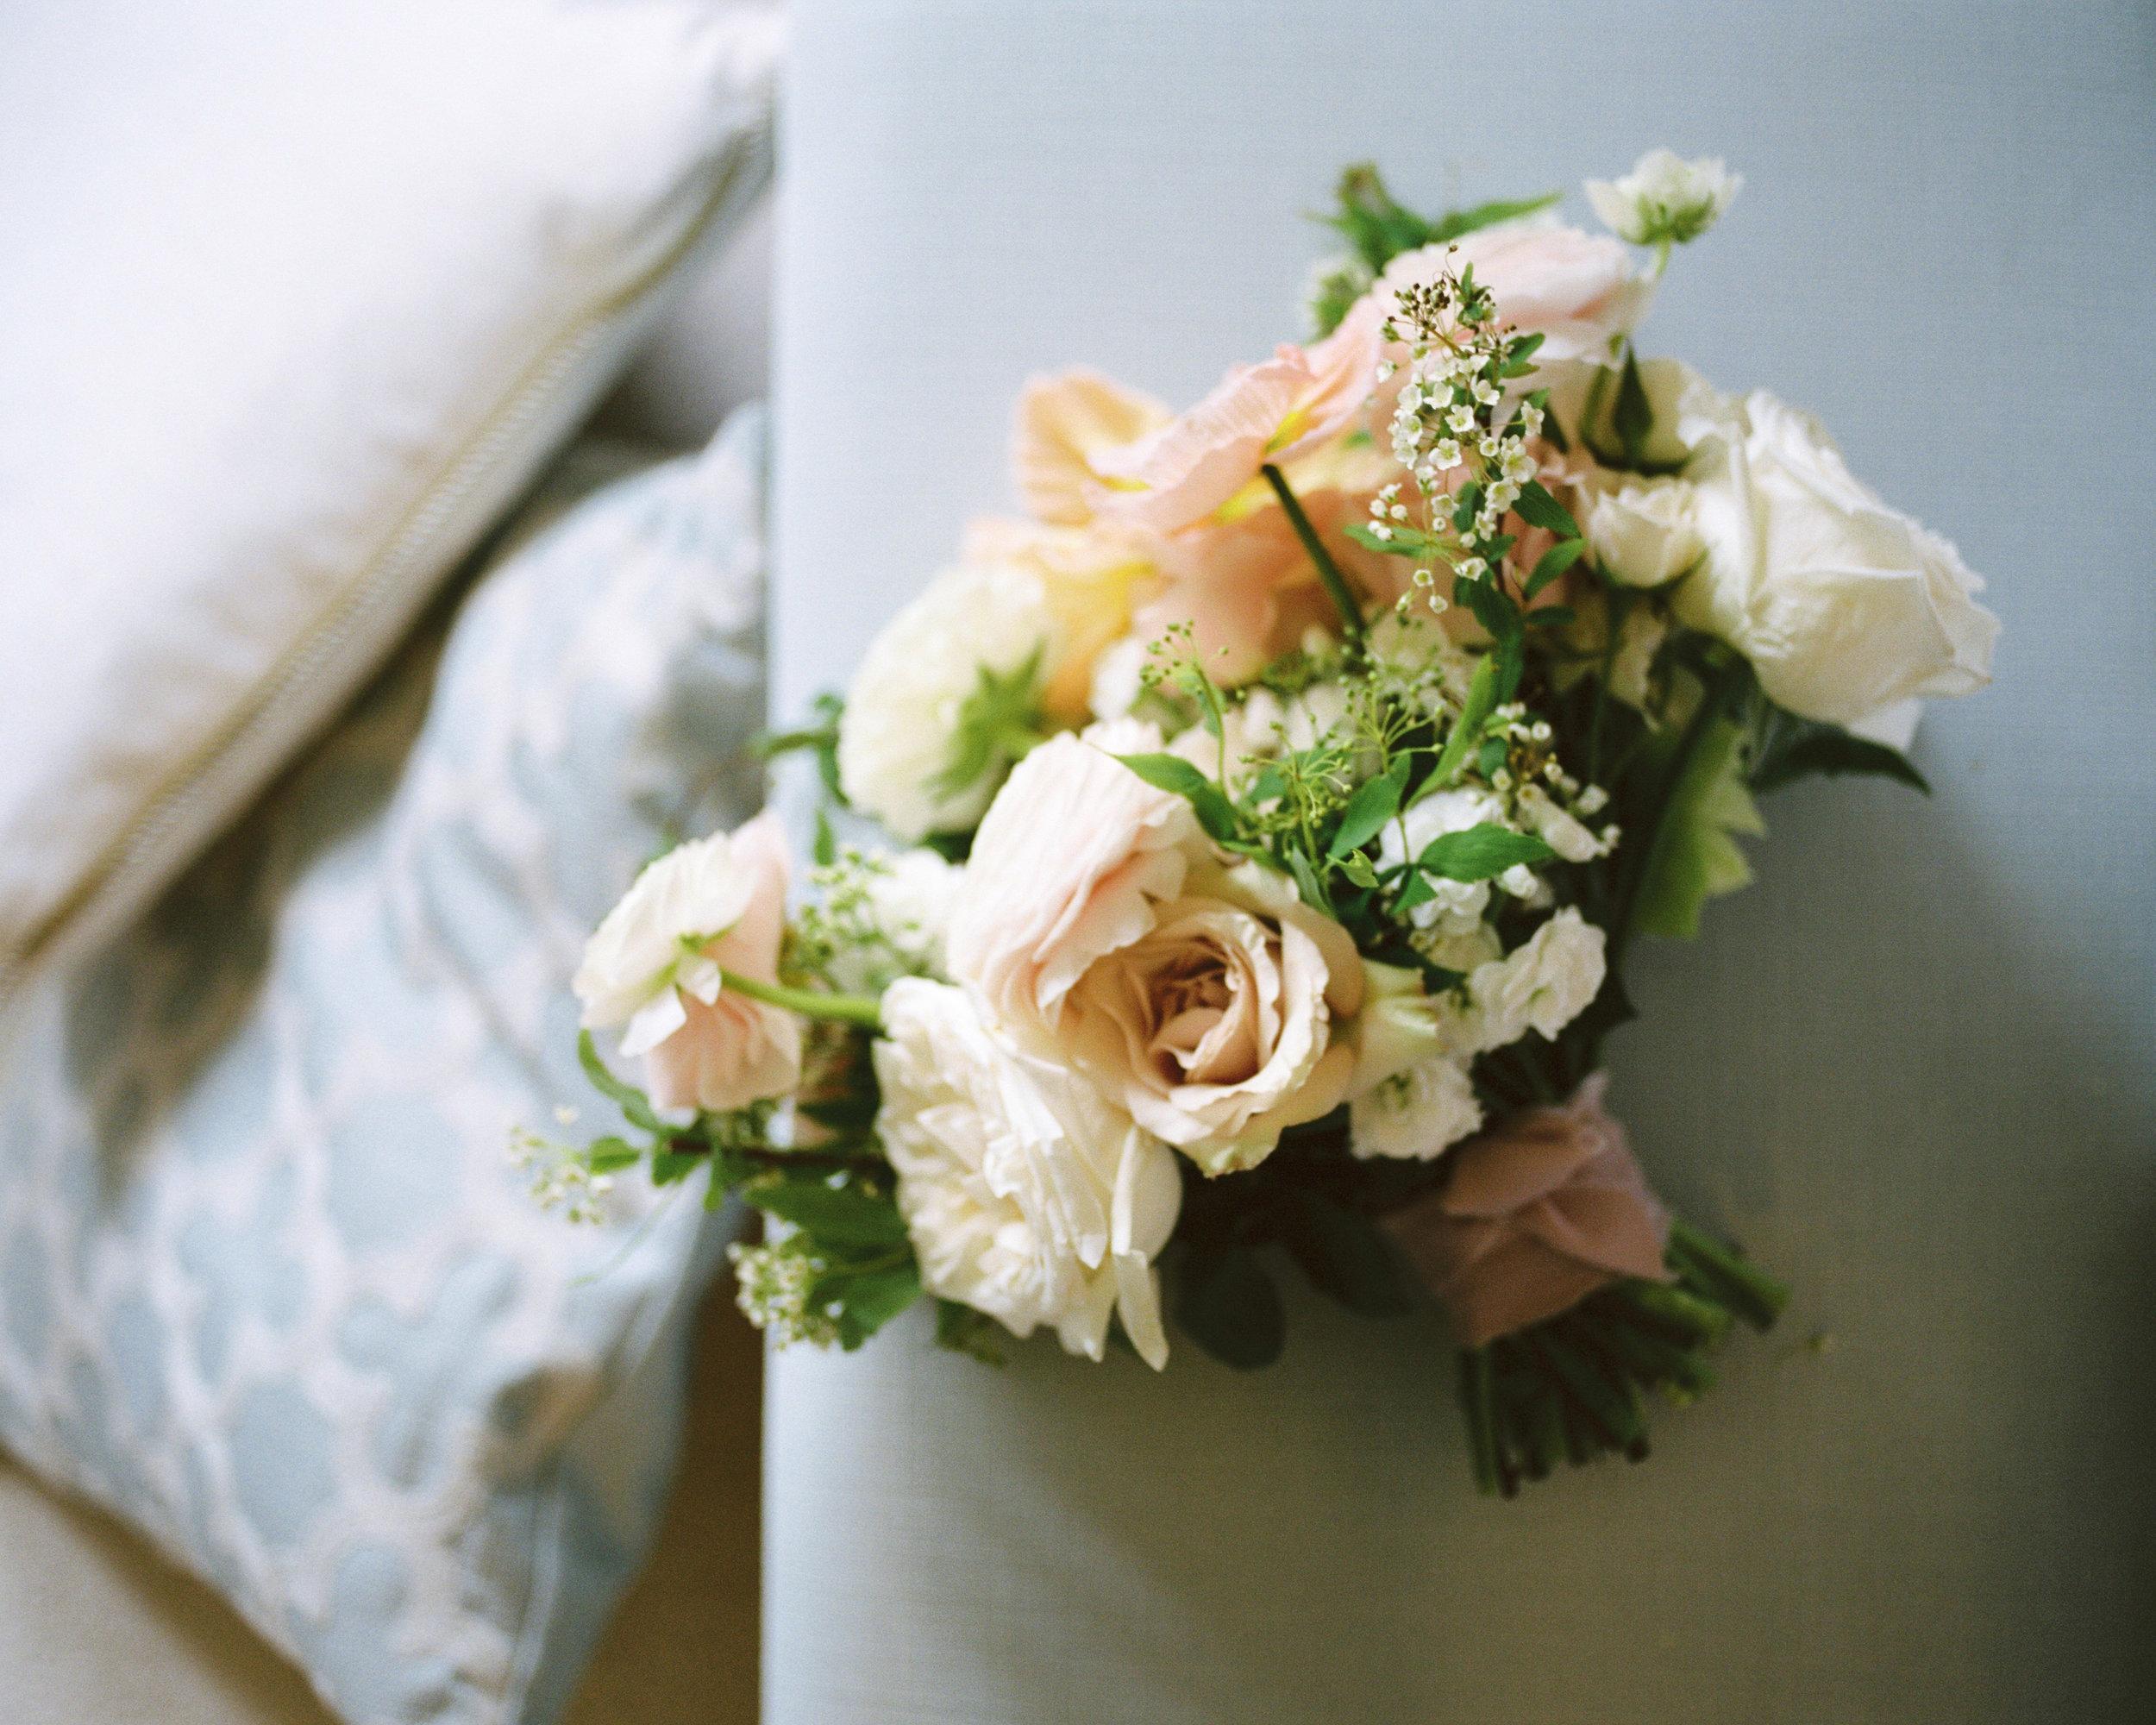 niagara_photographer_nataschia_wielink_ravine_wedding_4.jpg